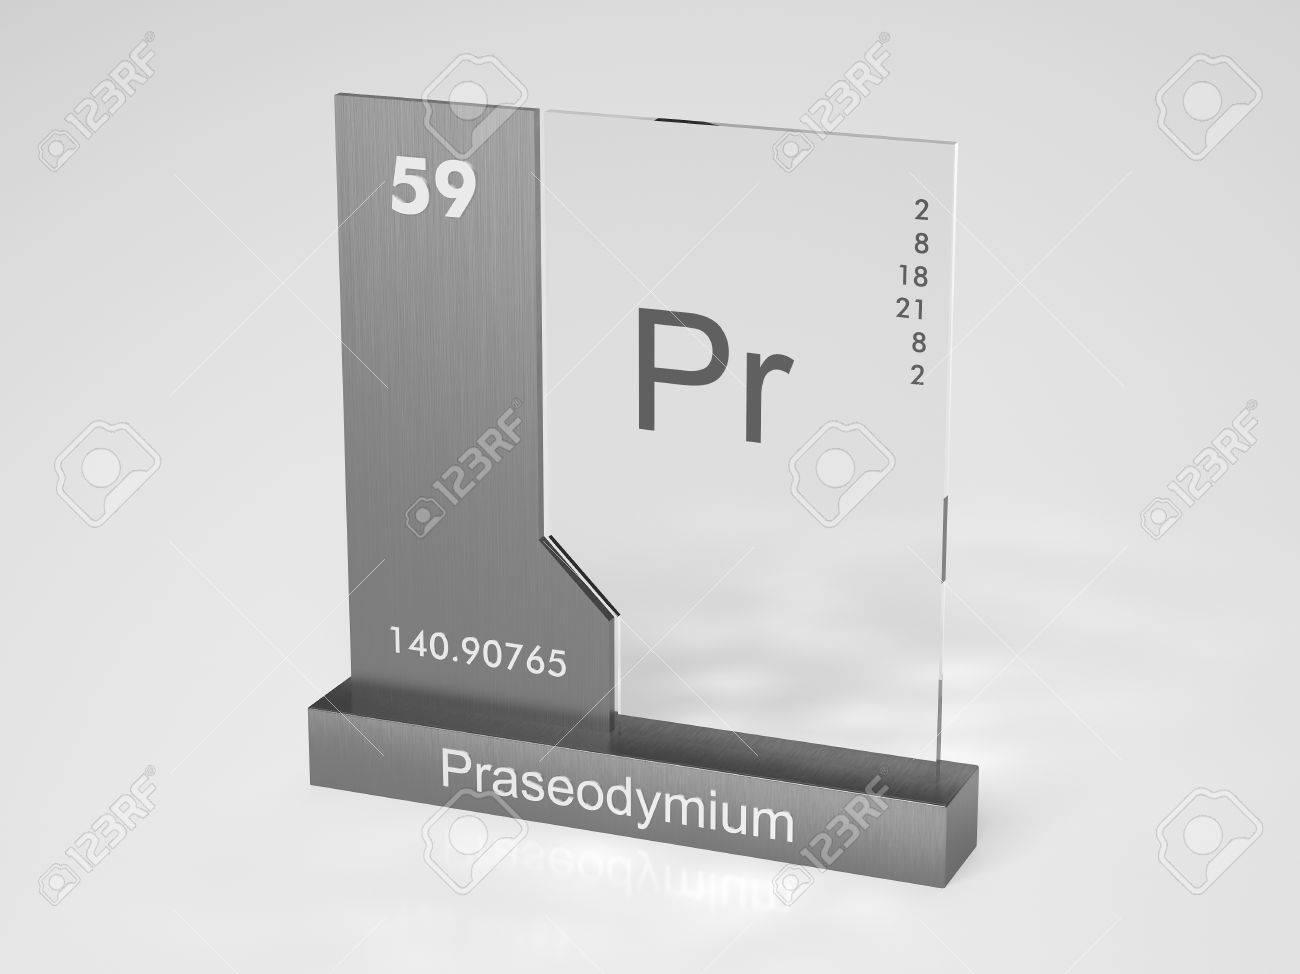 Praseodymium symbol pr chemical element of the periodic table praseodymium symbol pr chemical element of the periodic table stock photo 10470001 gamestrikefo Image collections